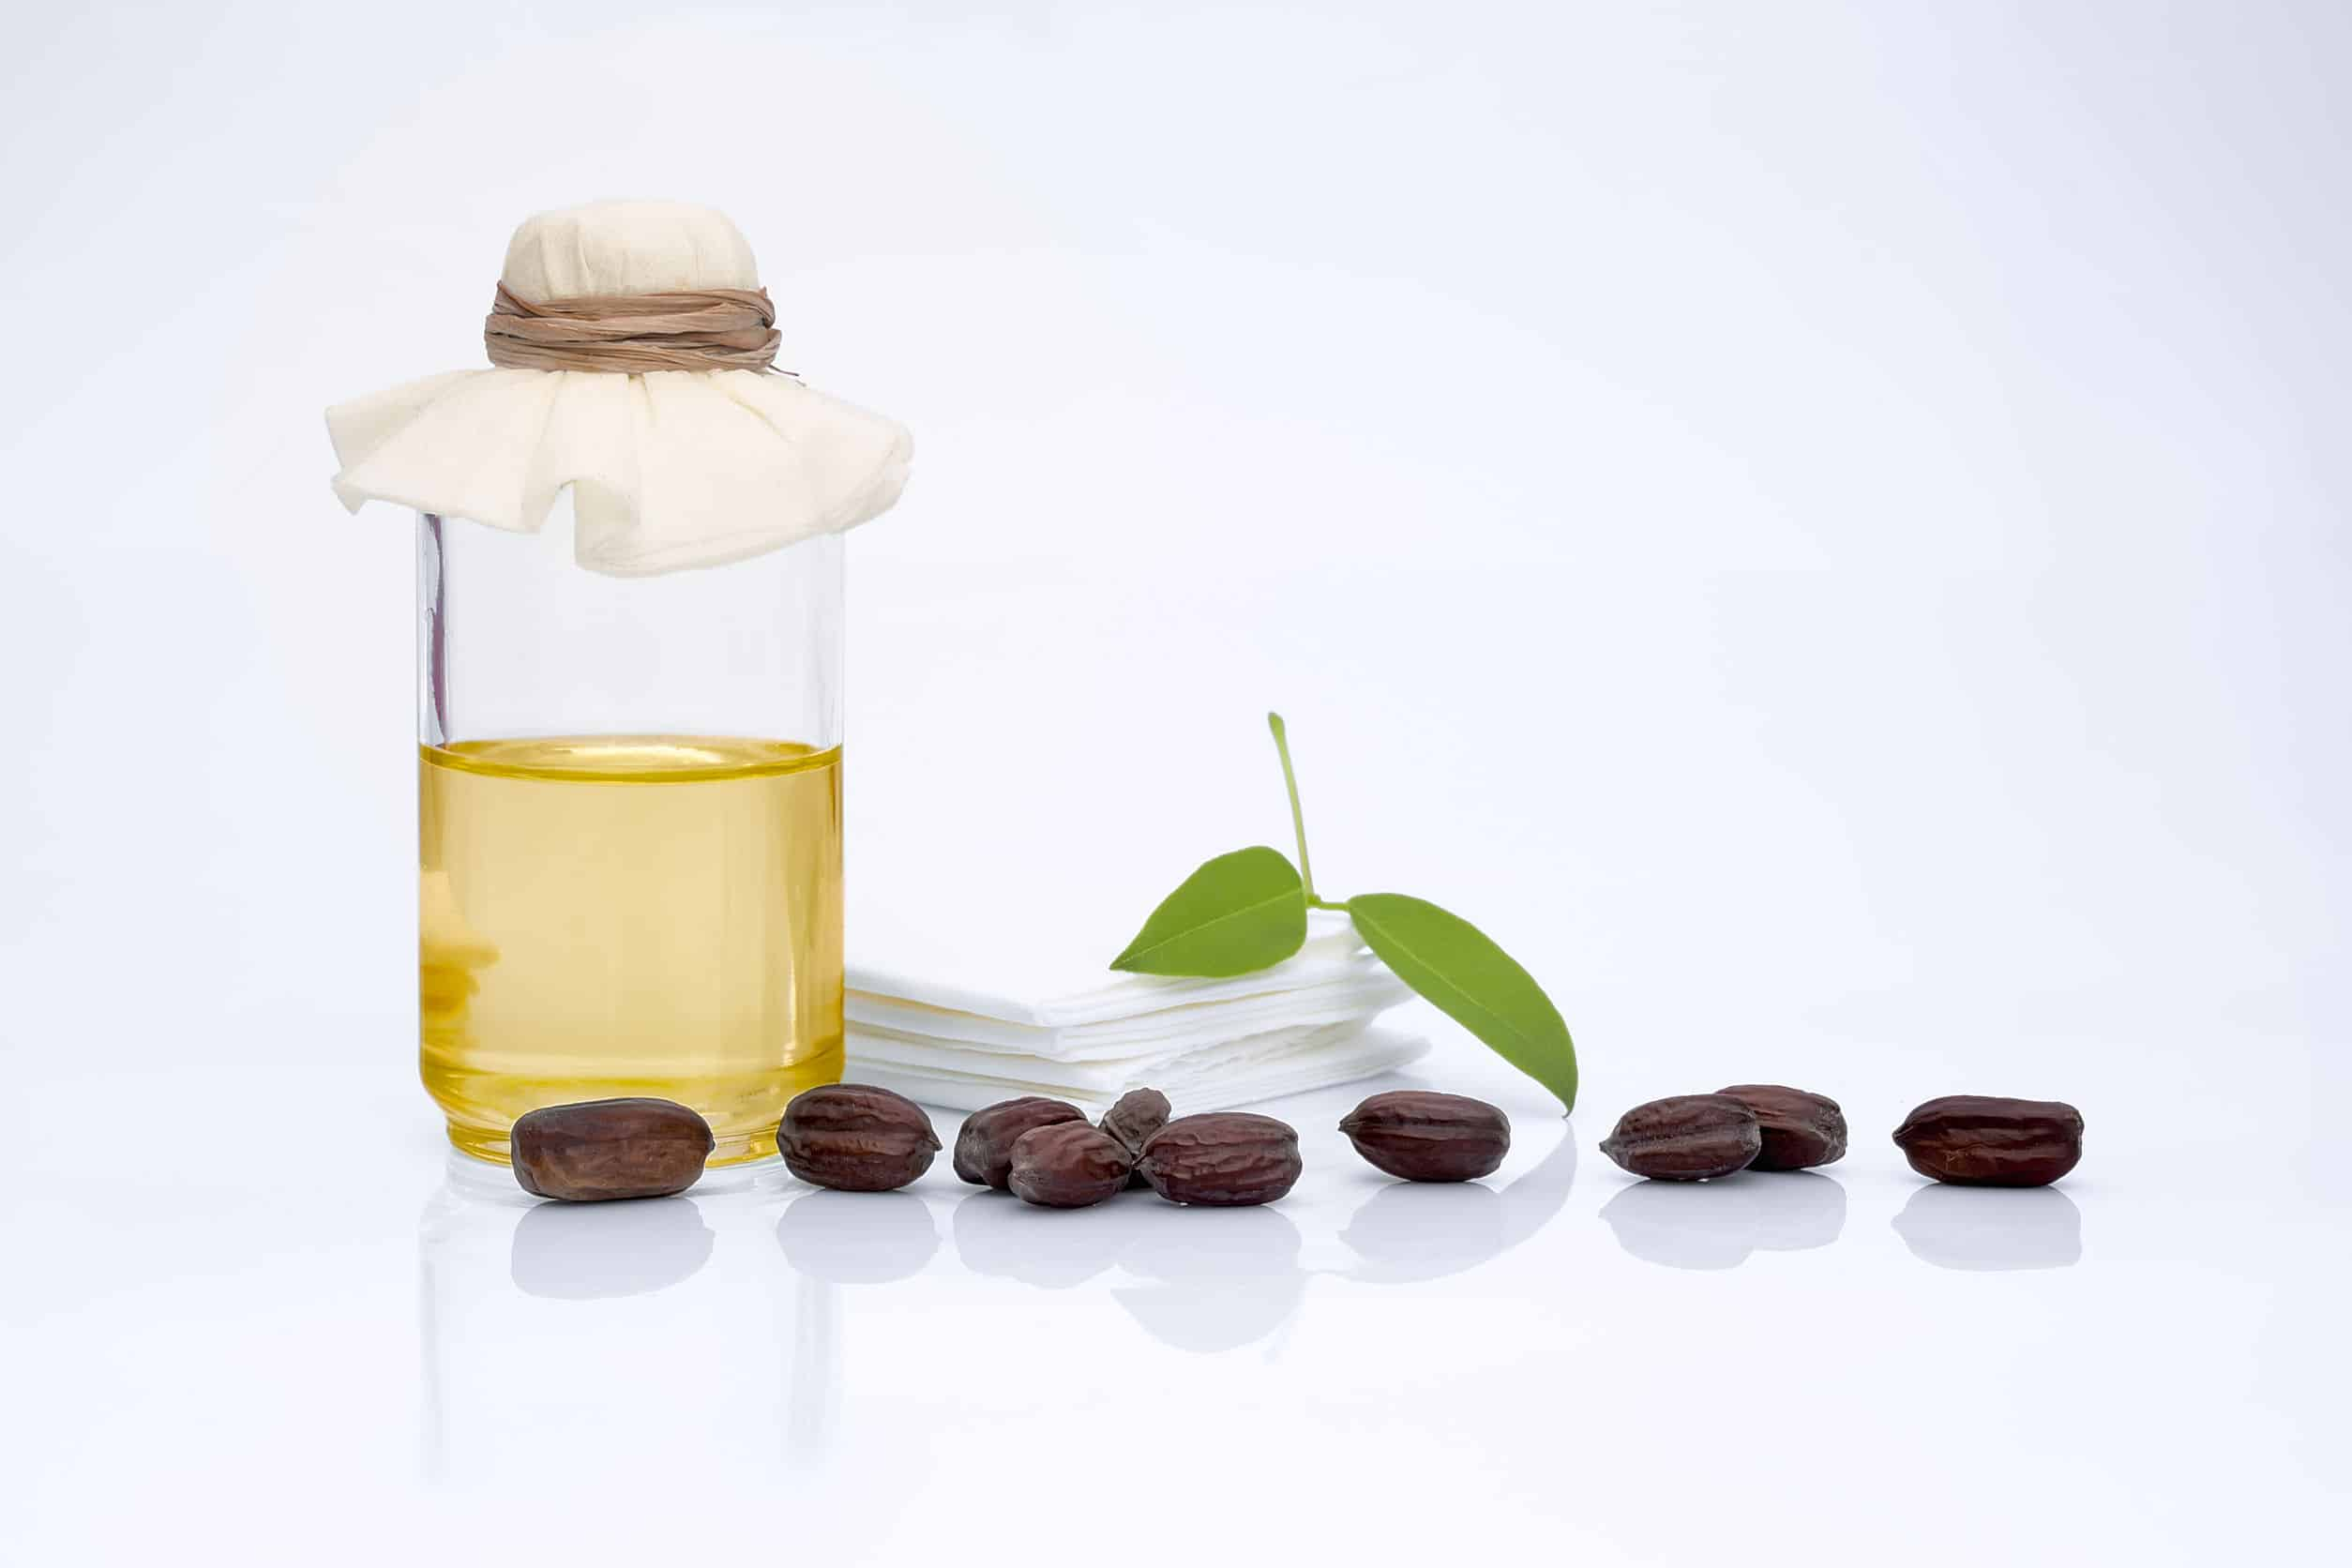 Donde comprar aceite de jojoba puro en mexico